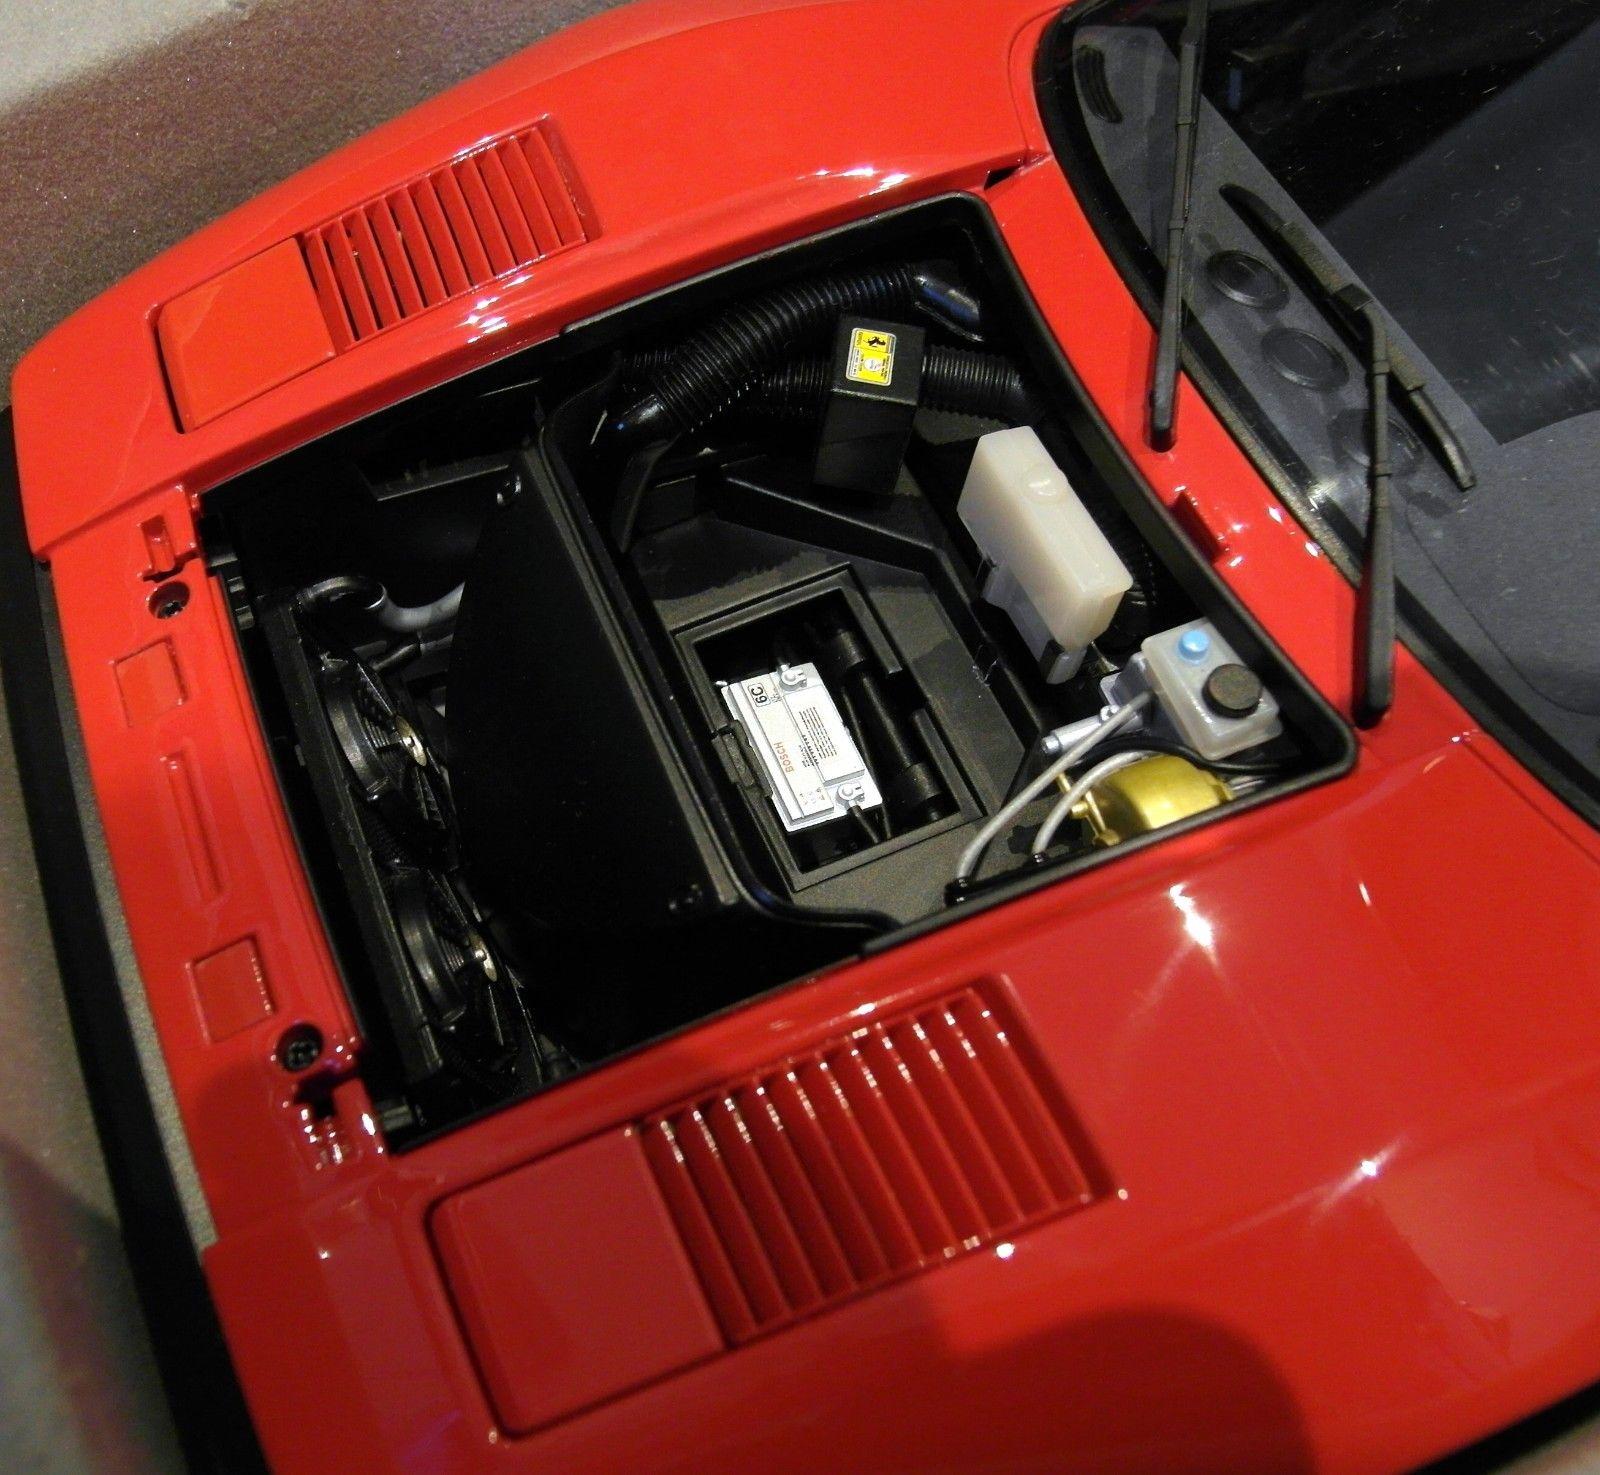 Tamiya 1/12 Scale - 23211 Ferrari 288 GTO Semi Assembled Premium Model | eBay